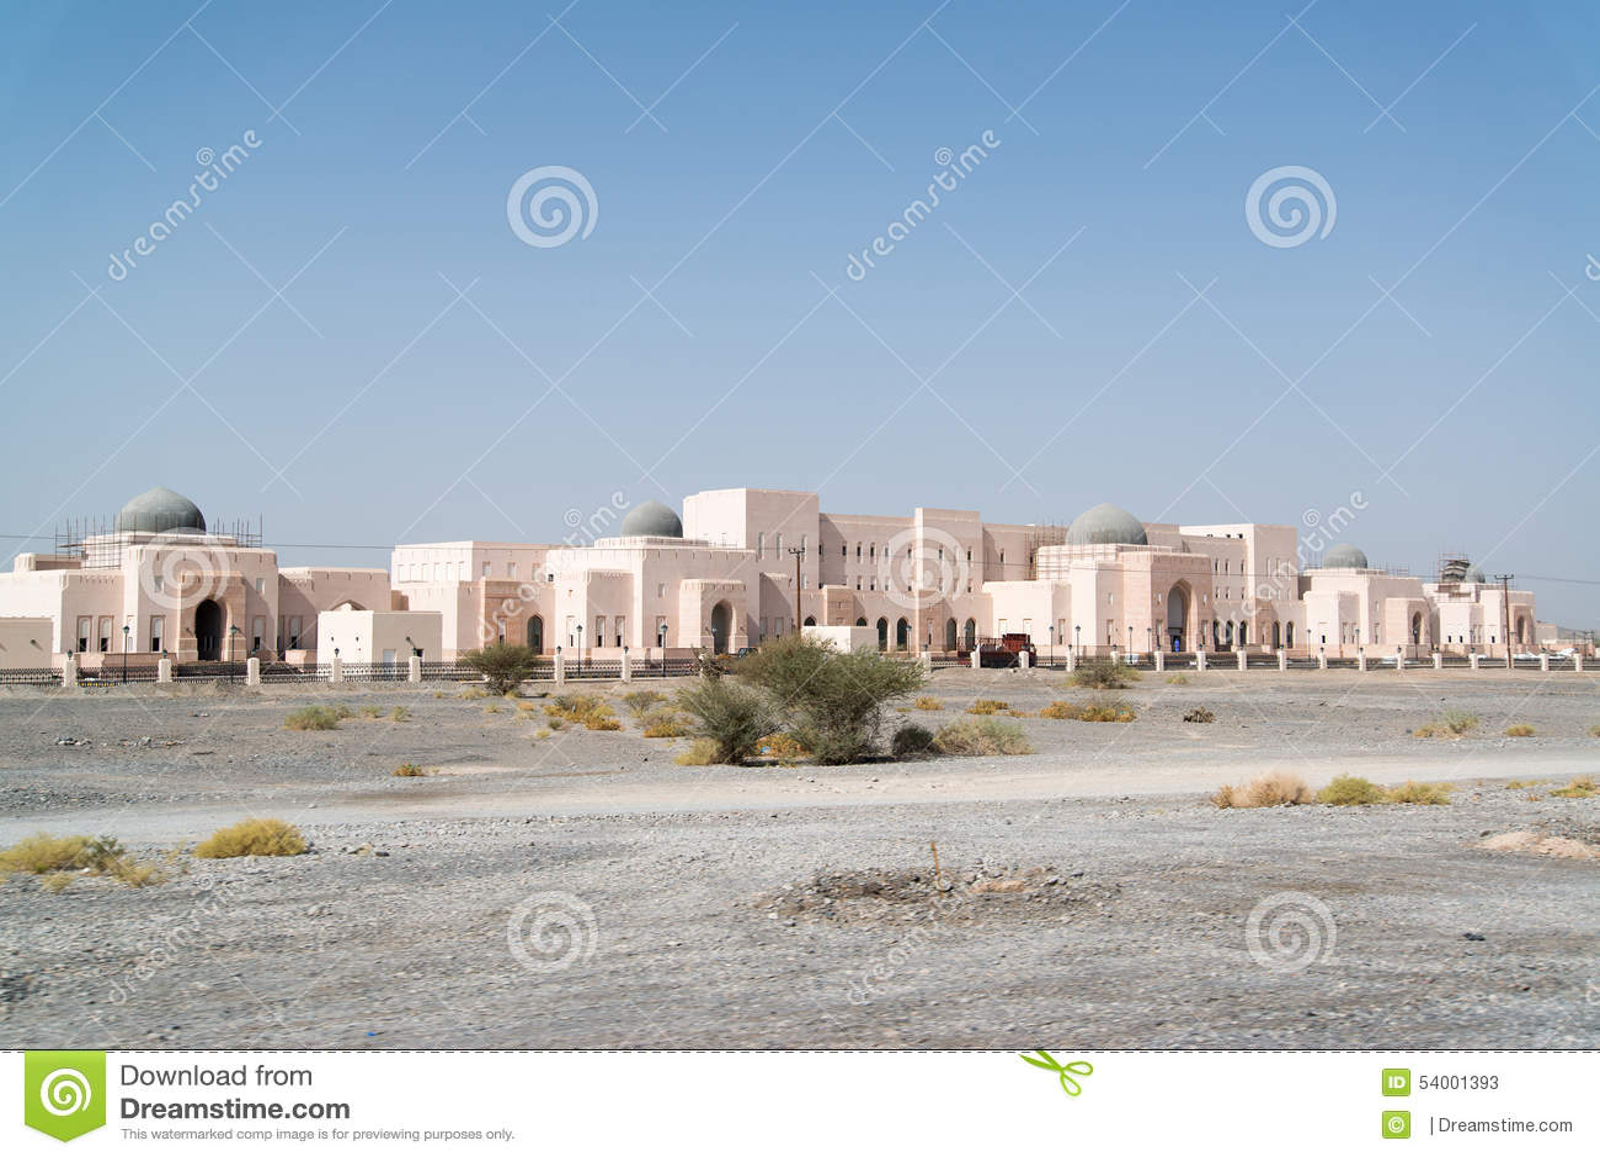 Oman buildings stock image  Image of change, land, driving